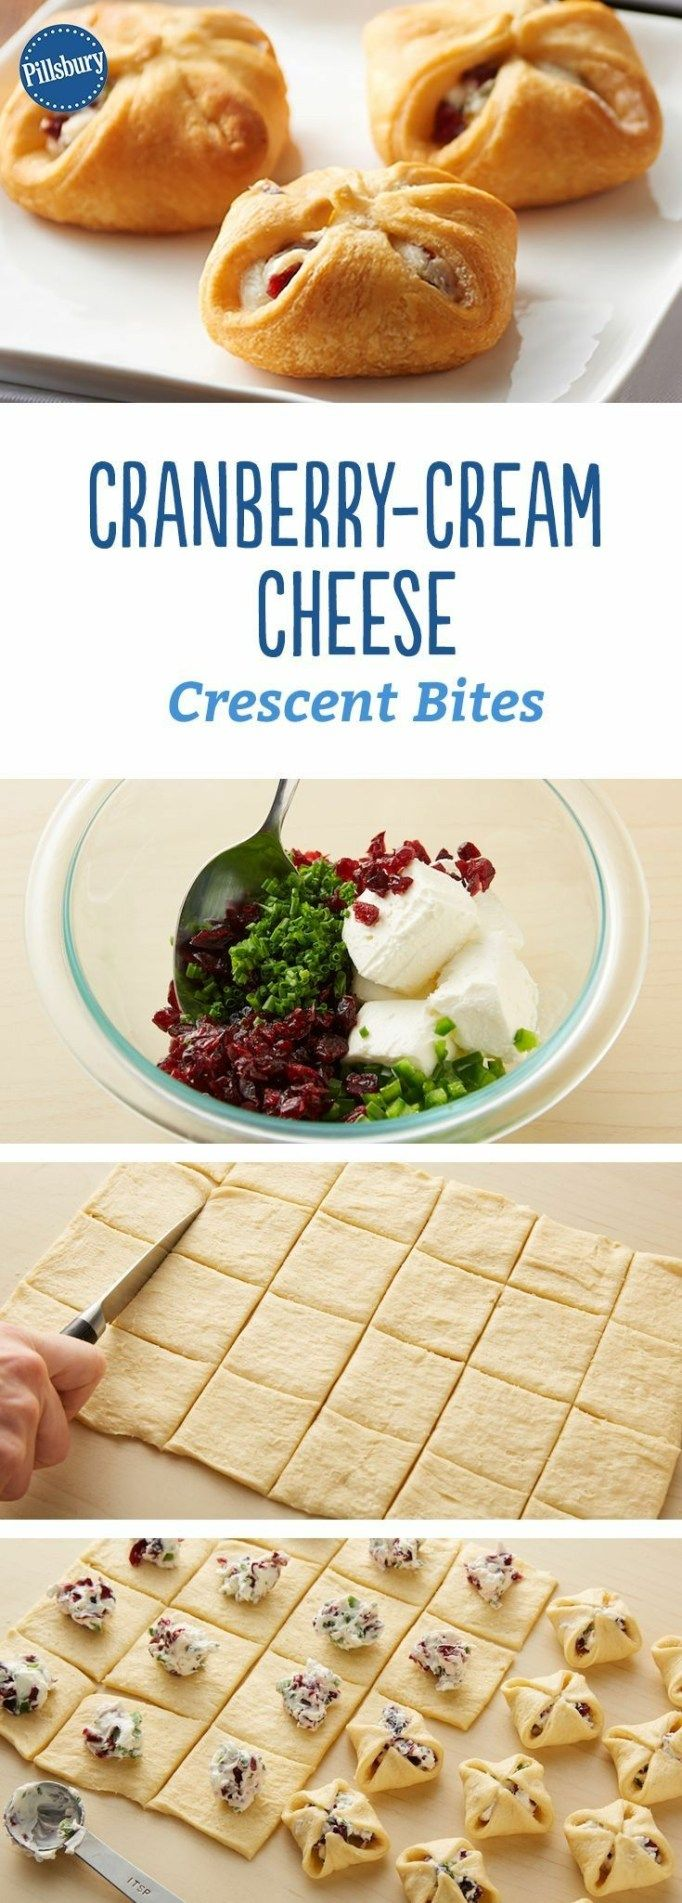 Cranberry-Cream Cheese Crescent Bites